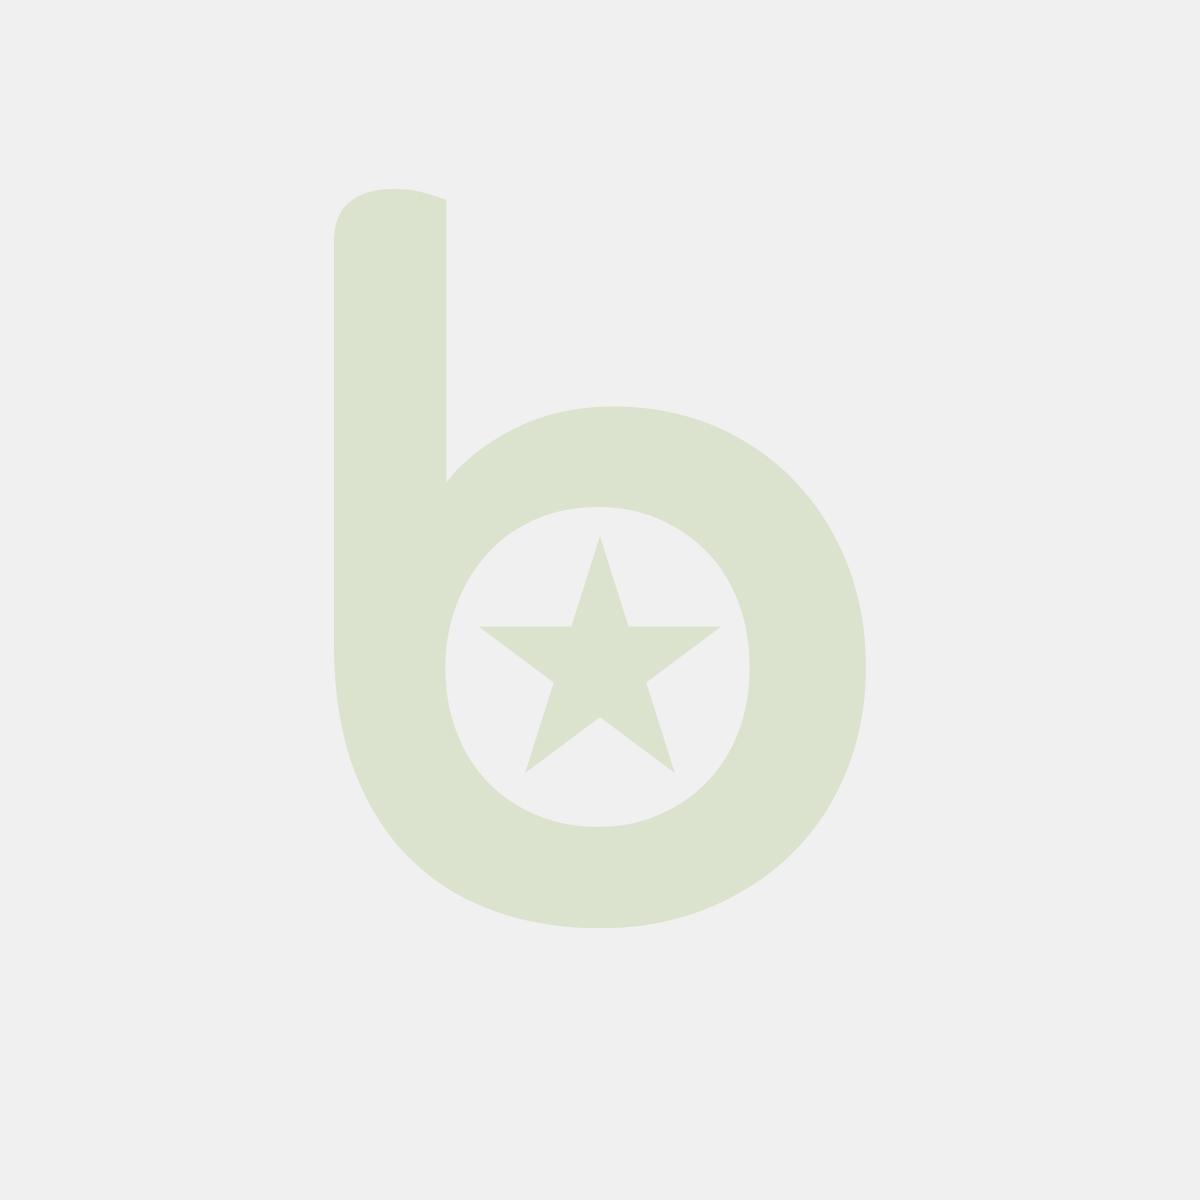 Koperty samoklejące (SK) NC, brązowe, 25 sztuk, C5, 31423027